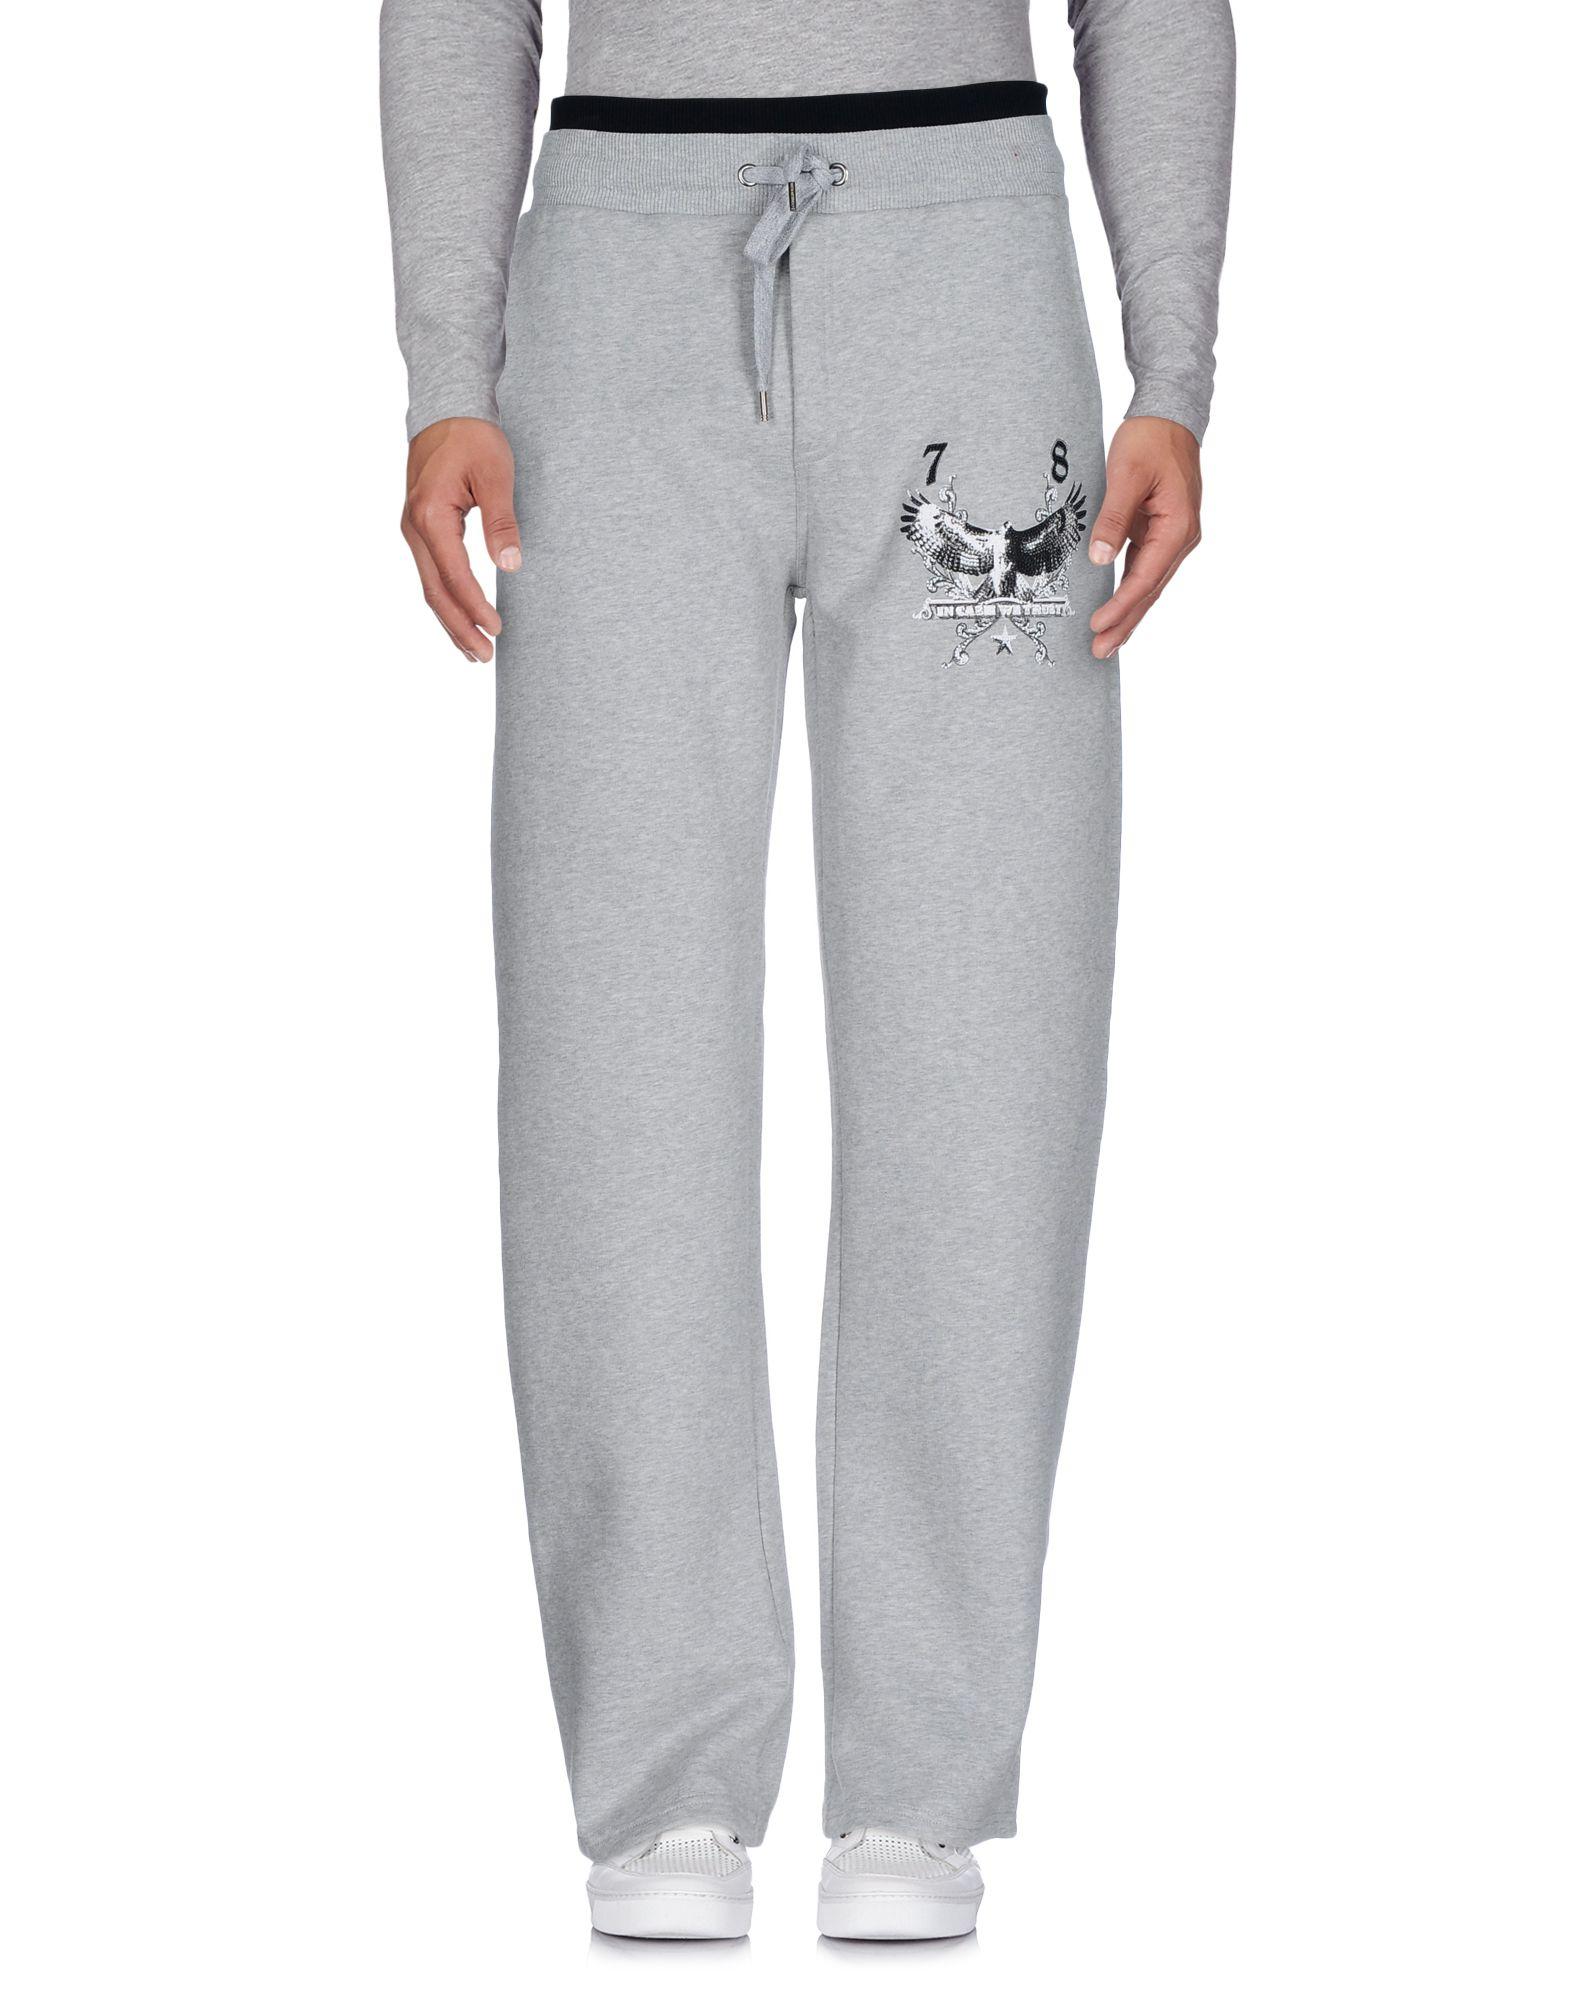 Pantalone Philipp Plein Uomo - Acquista online su